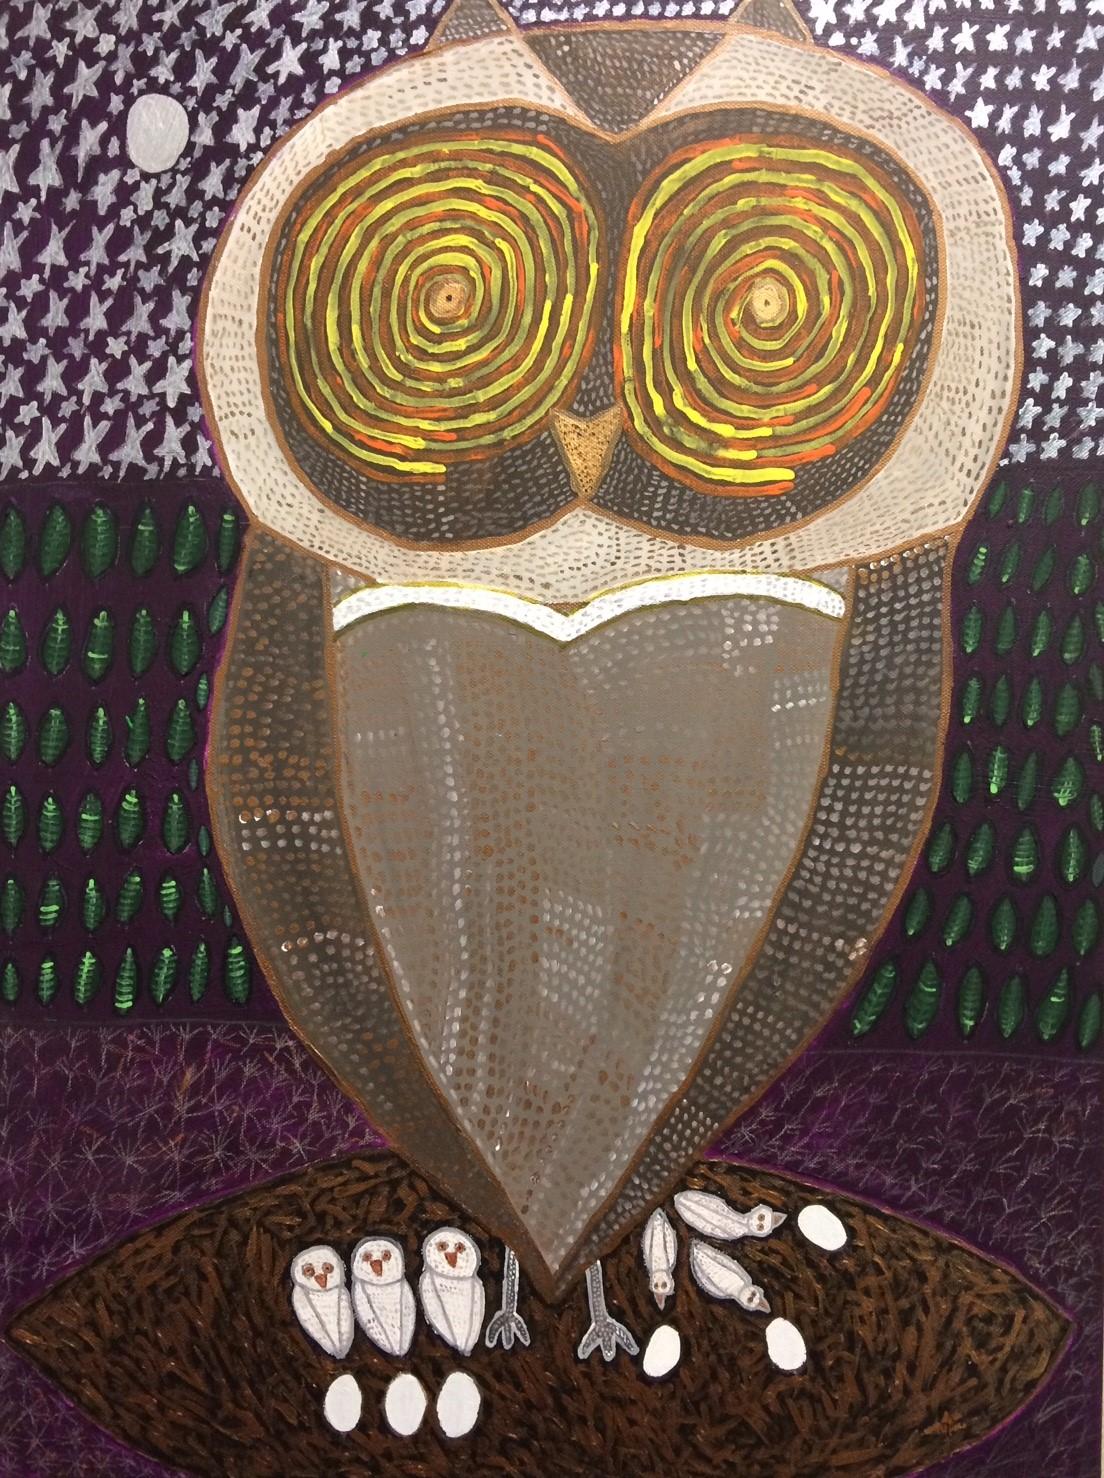 Owl watching Geyser going off.